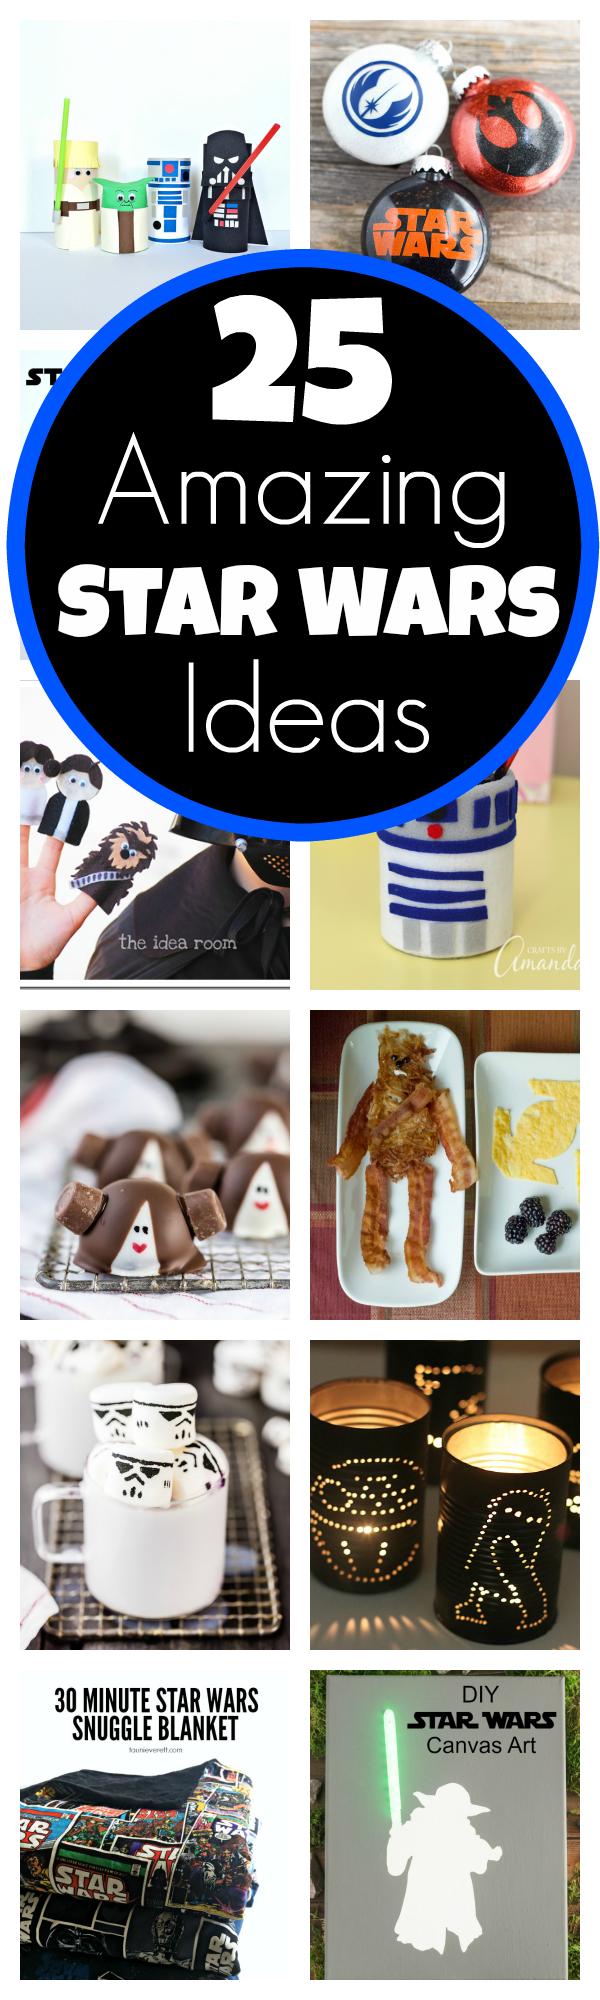 25 Amazing Star Wars Ideas